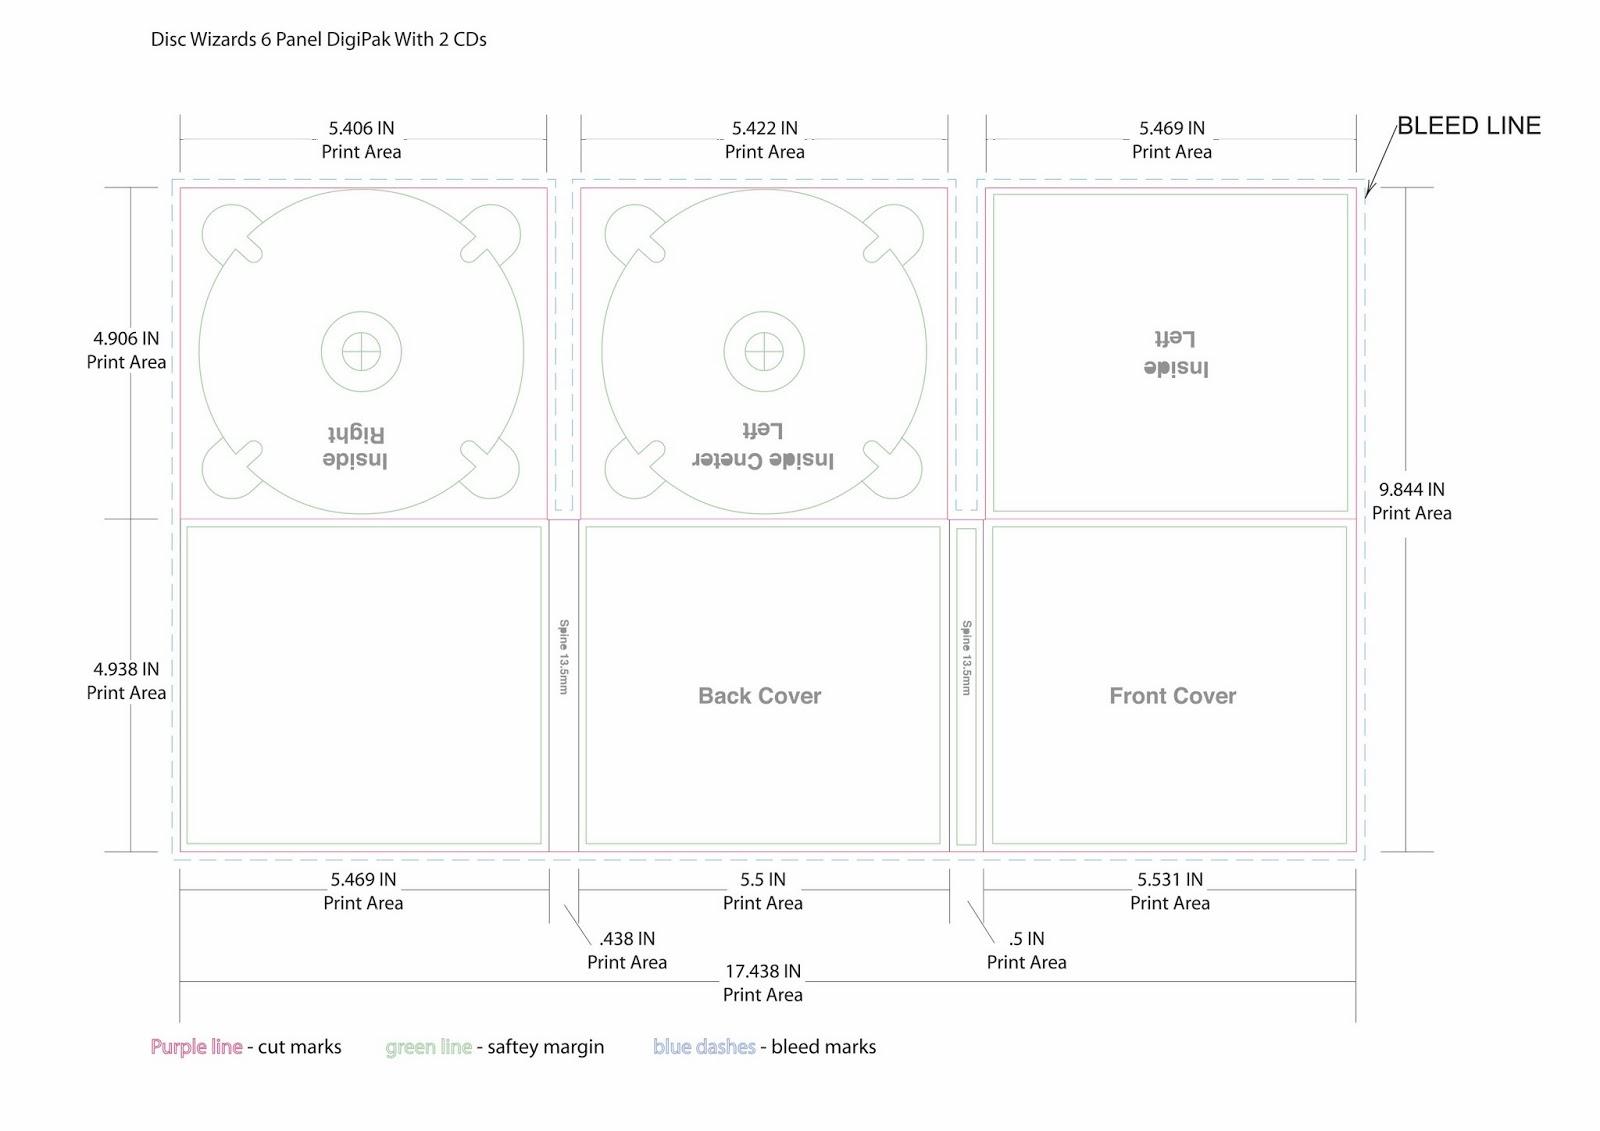 a2 media digipak template. Black Bedroom Furniture Sets. Home Design Ideas